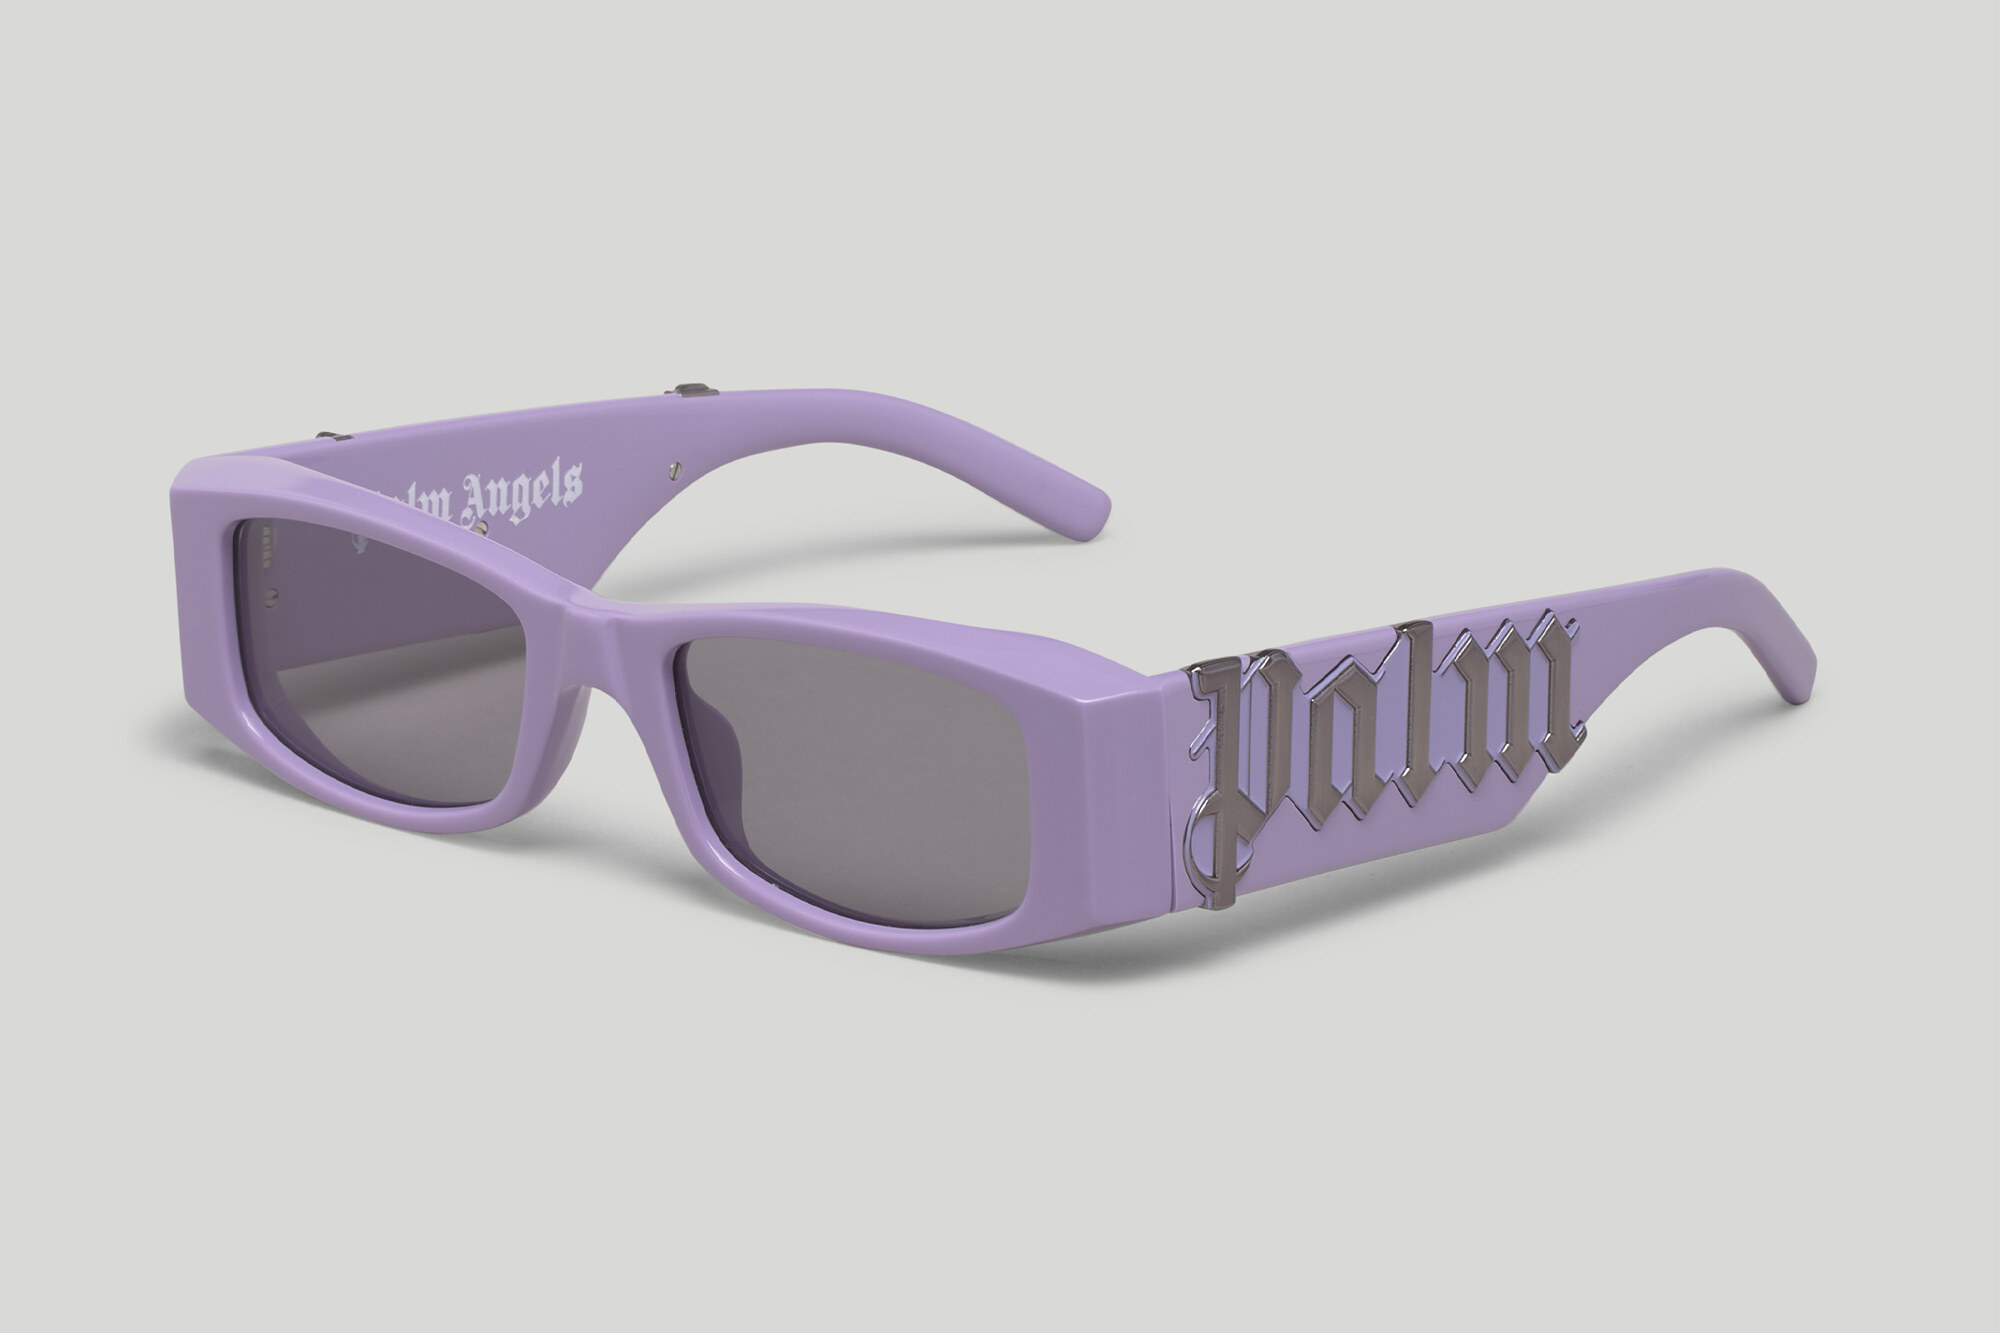 Palm Angels Eyewear ANGEL style